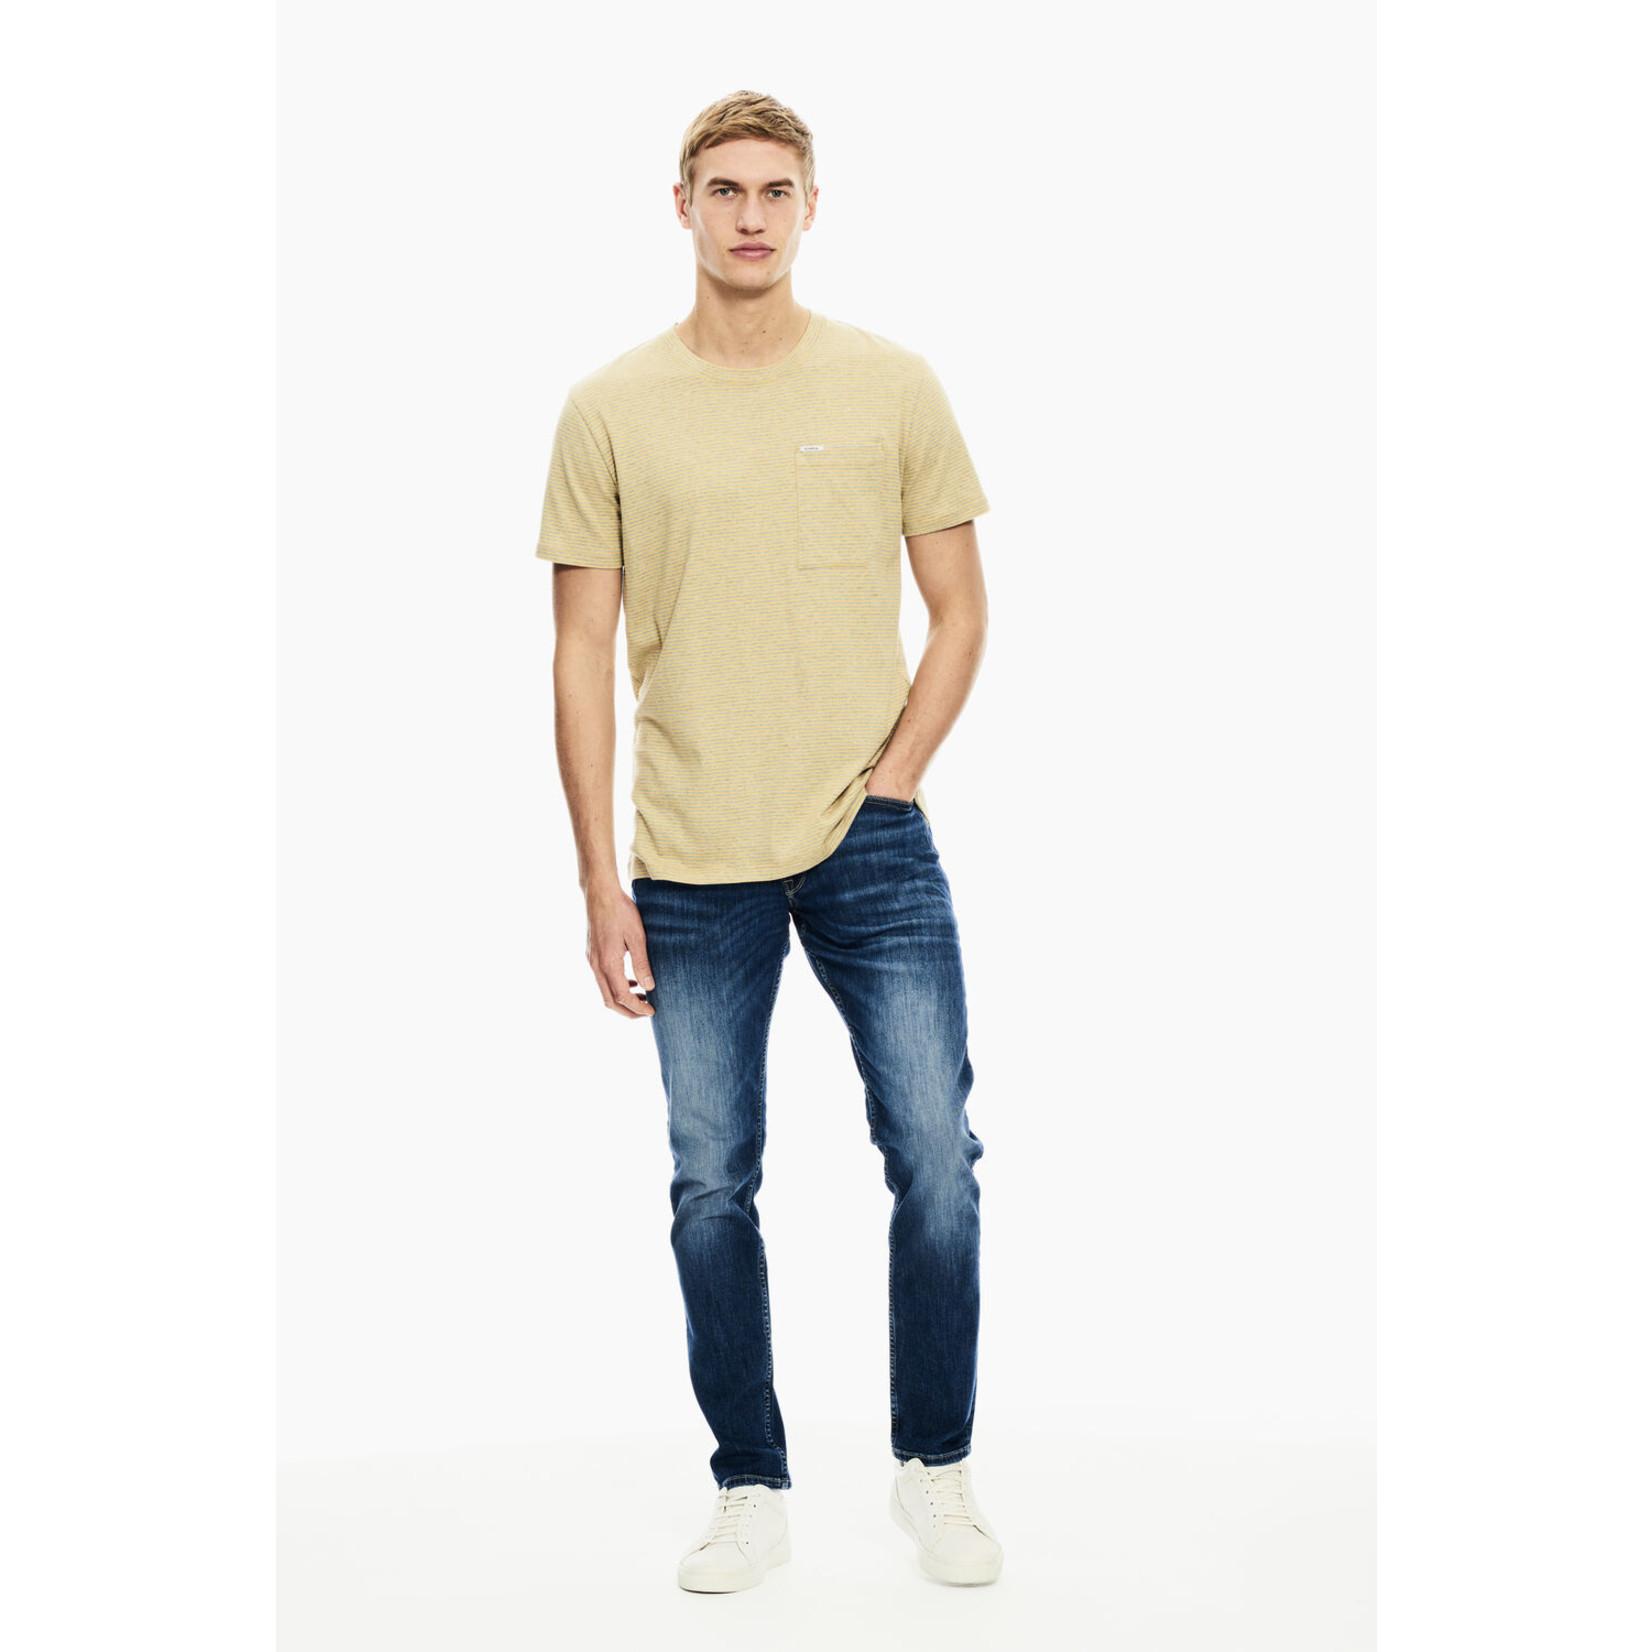 Garcia Garcia C11009 Short-Sleeve Striped T-Shirt